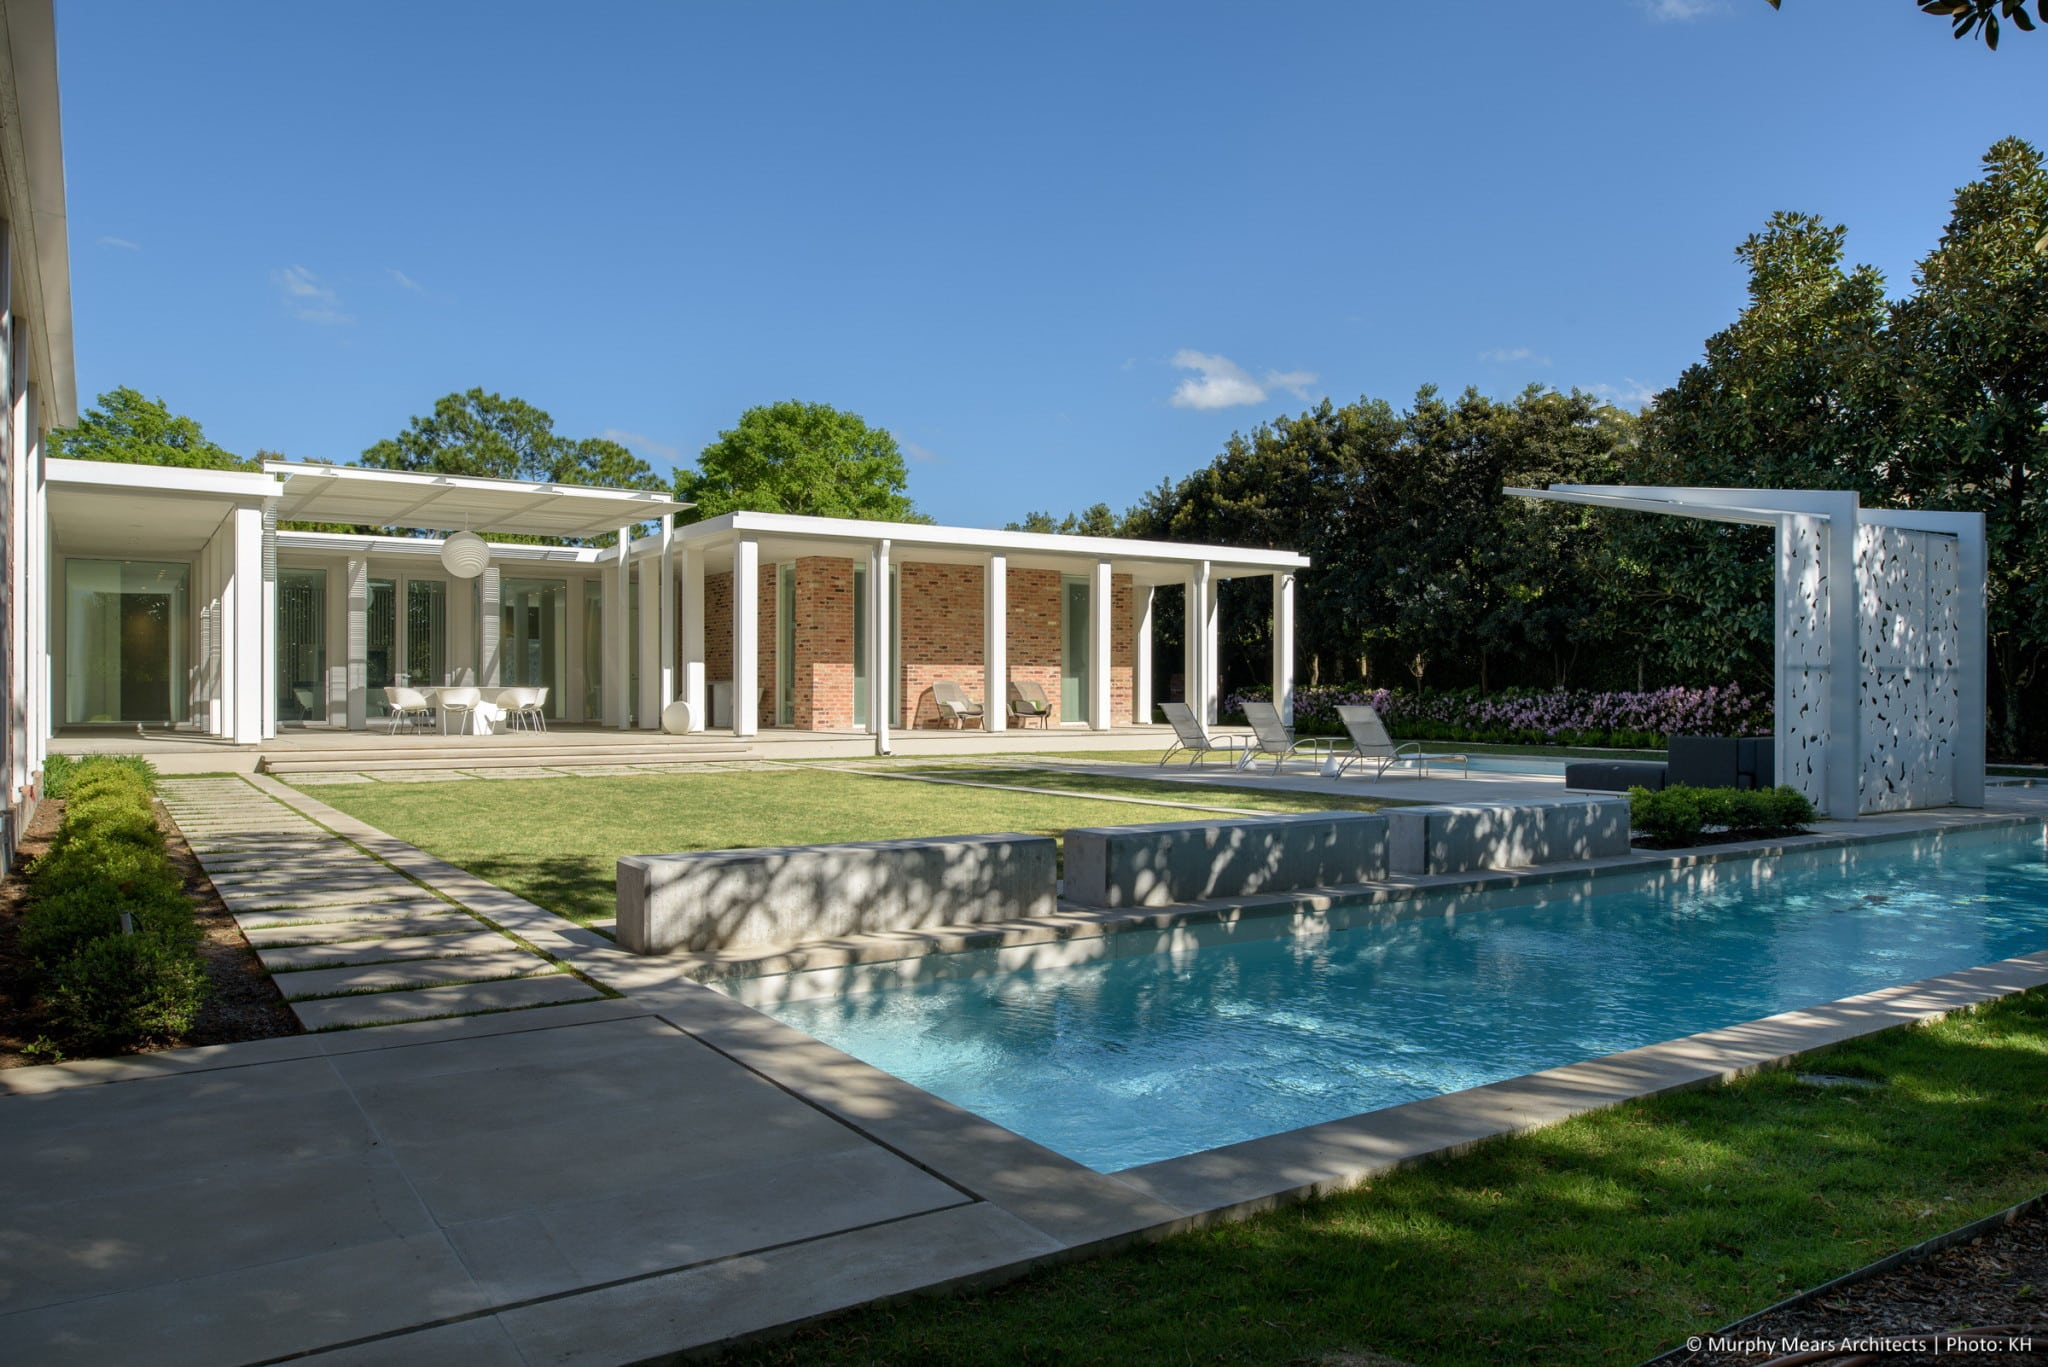 w-mid-century-modern-home-neuhaus-harwood-taylor-renovation-back-yard-trellis-lap-pool.jpg